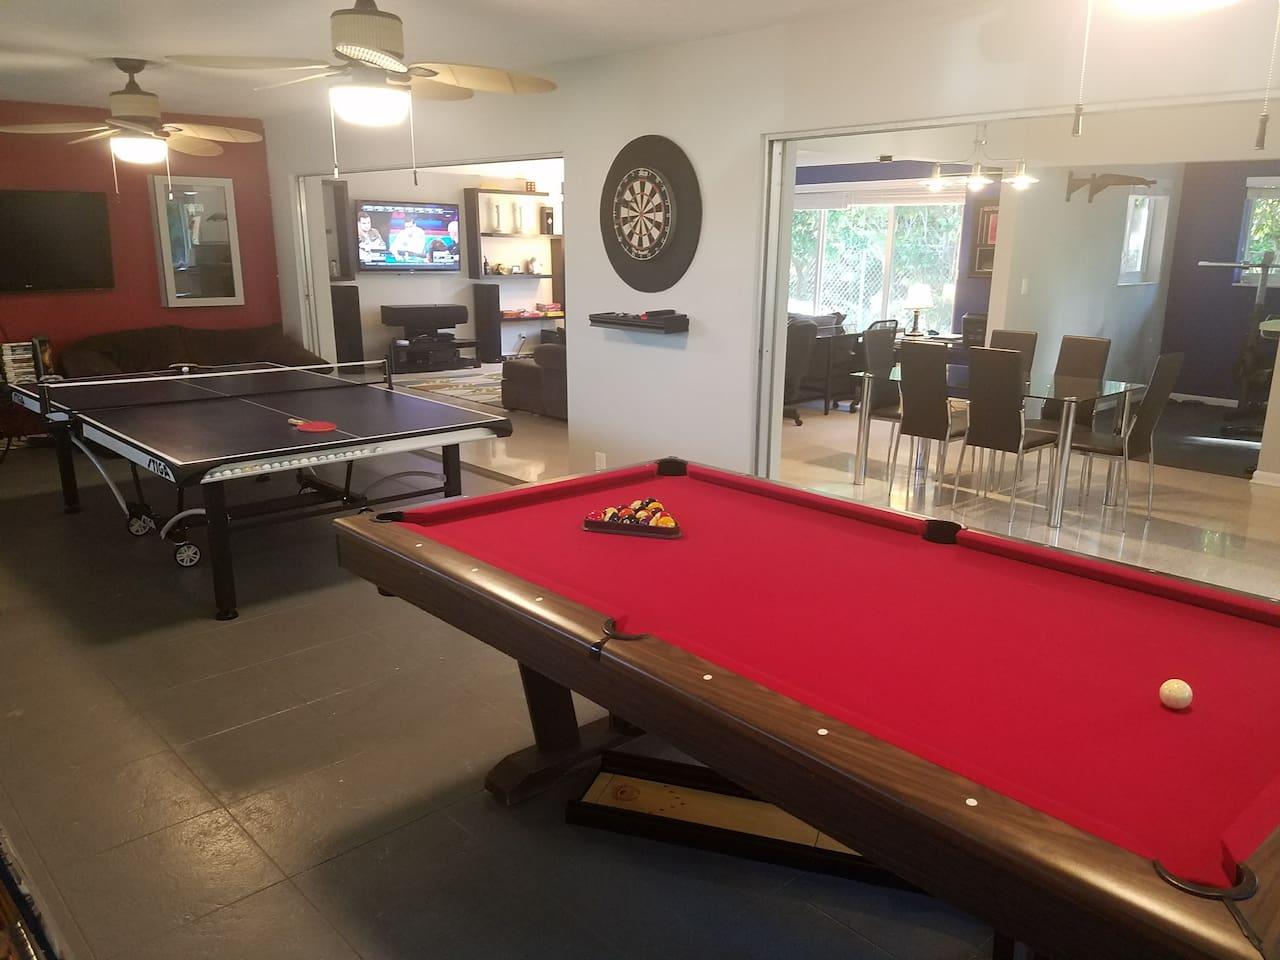 Game Room (Pool Table, Ping Pong, Darts, Cornhole, N64, Xbox 360)